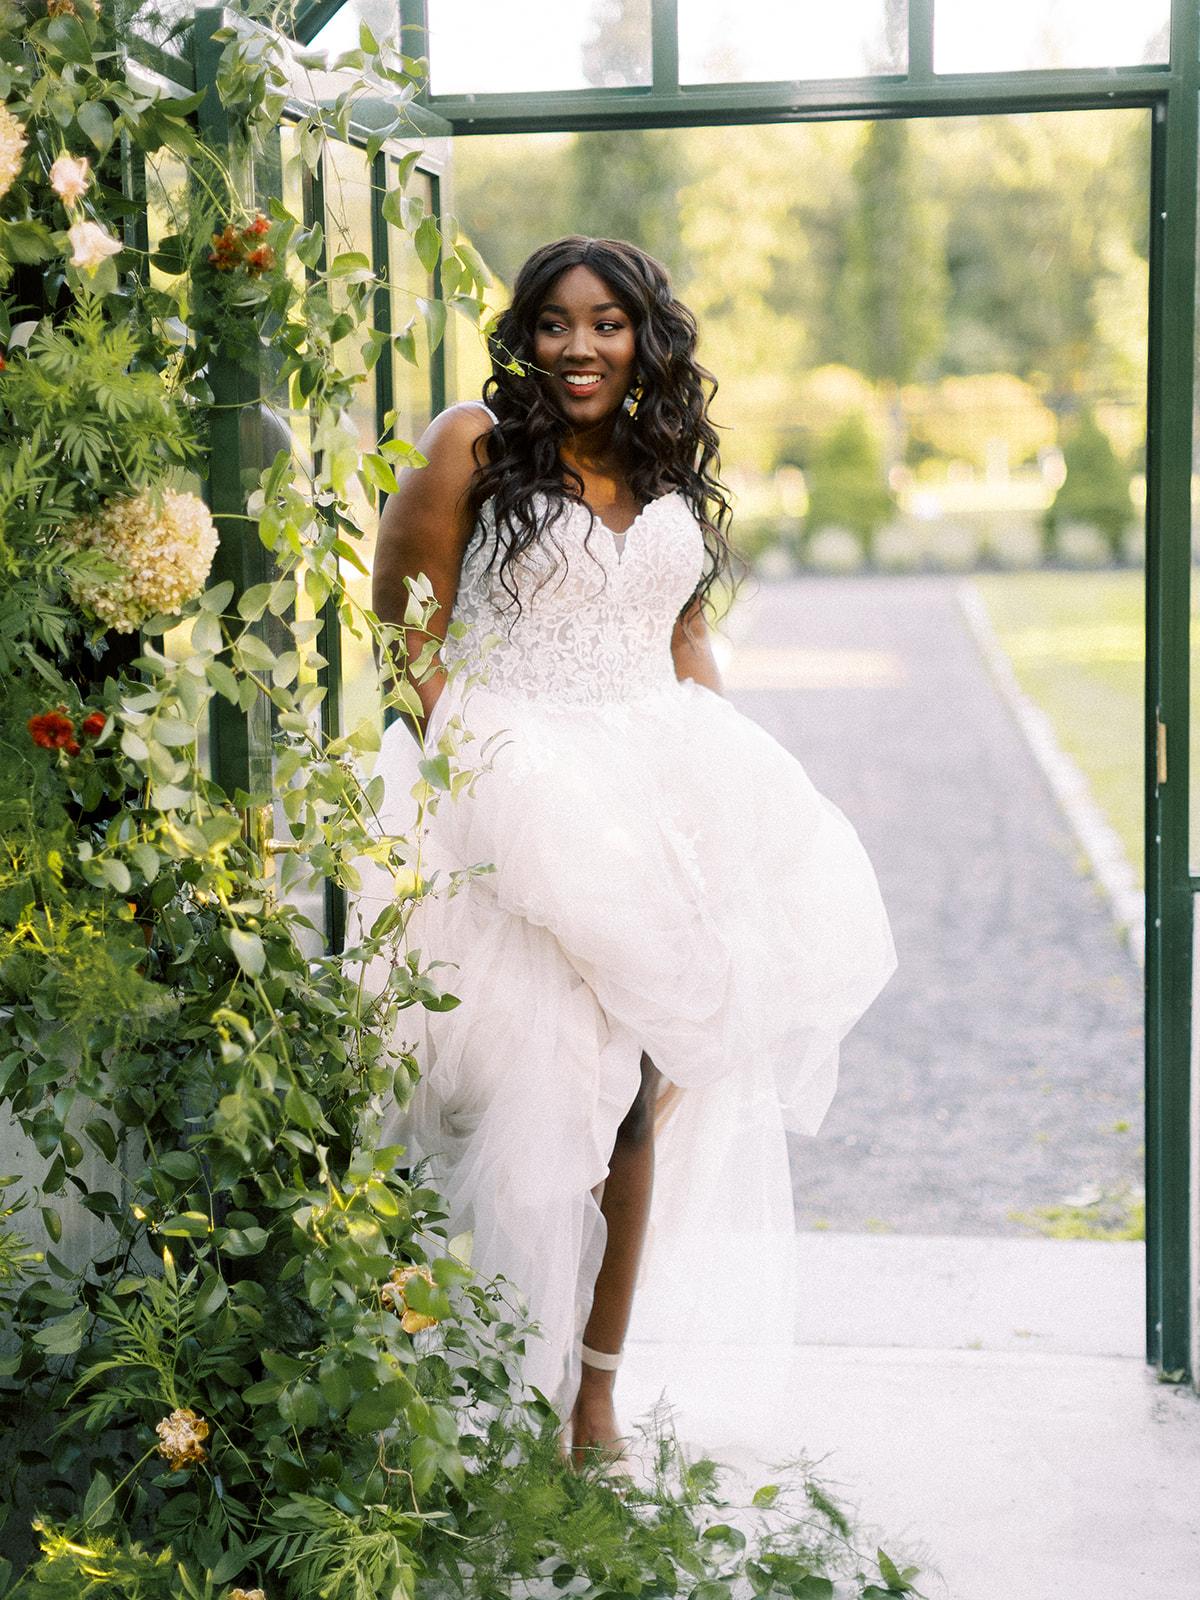 Model in Greenhouse Wearing Plus Size Lightweight A-line Wedding Dress Called Marisol by Rebecca Ingram